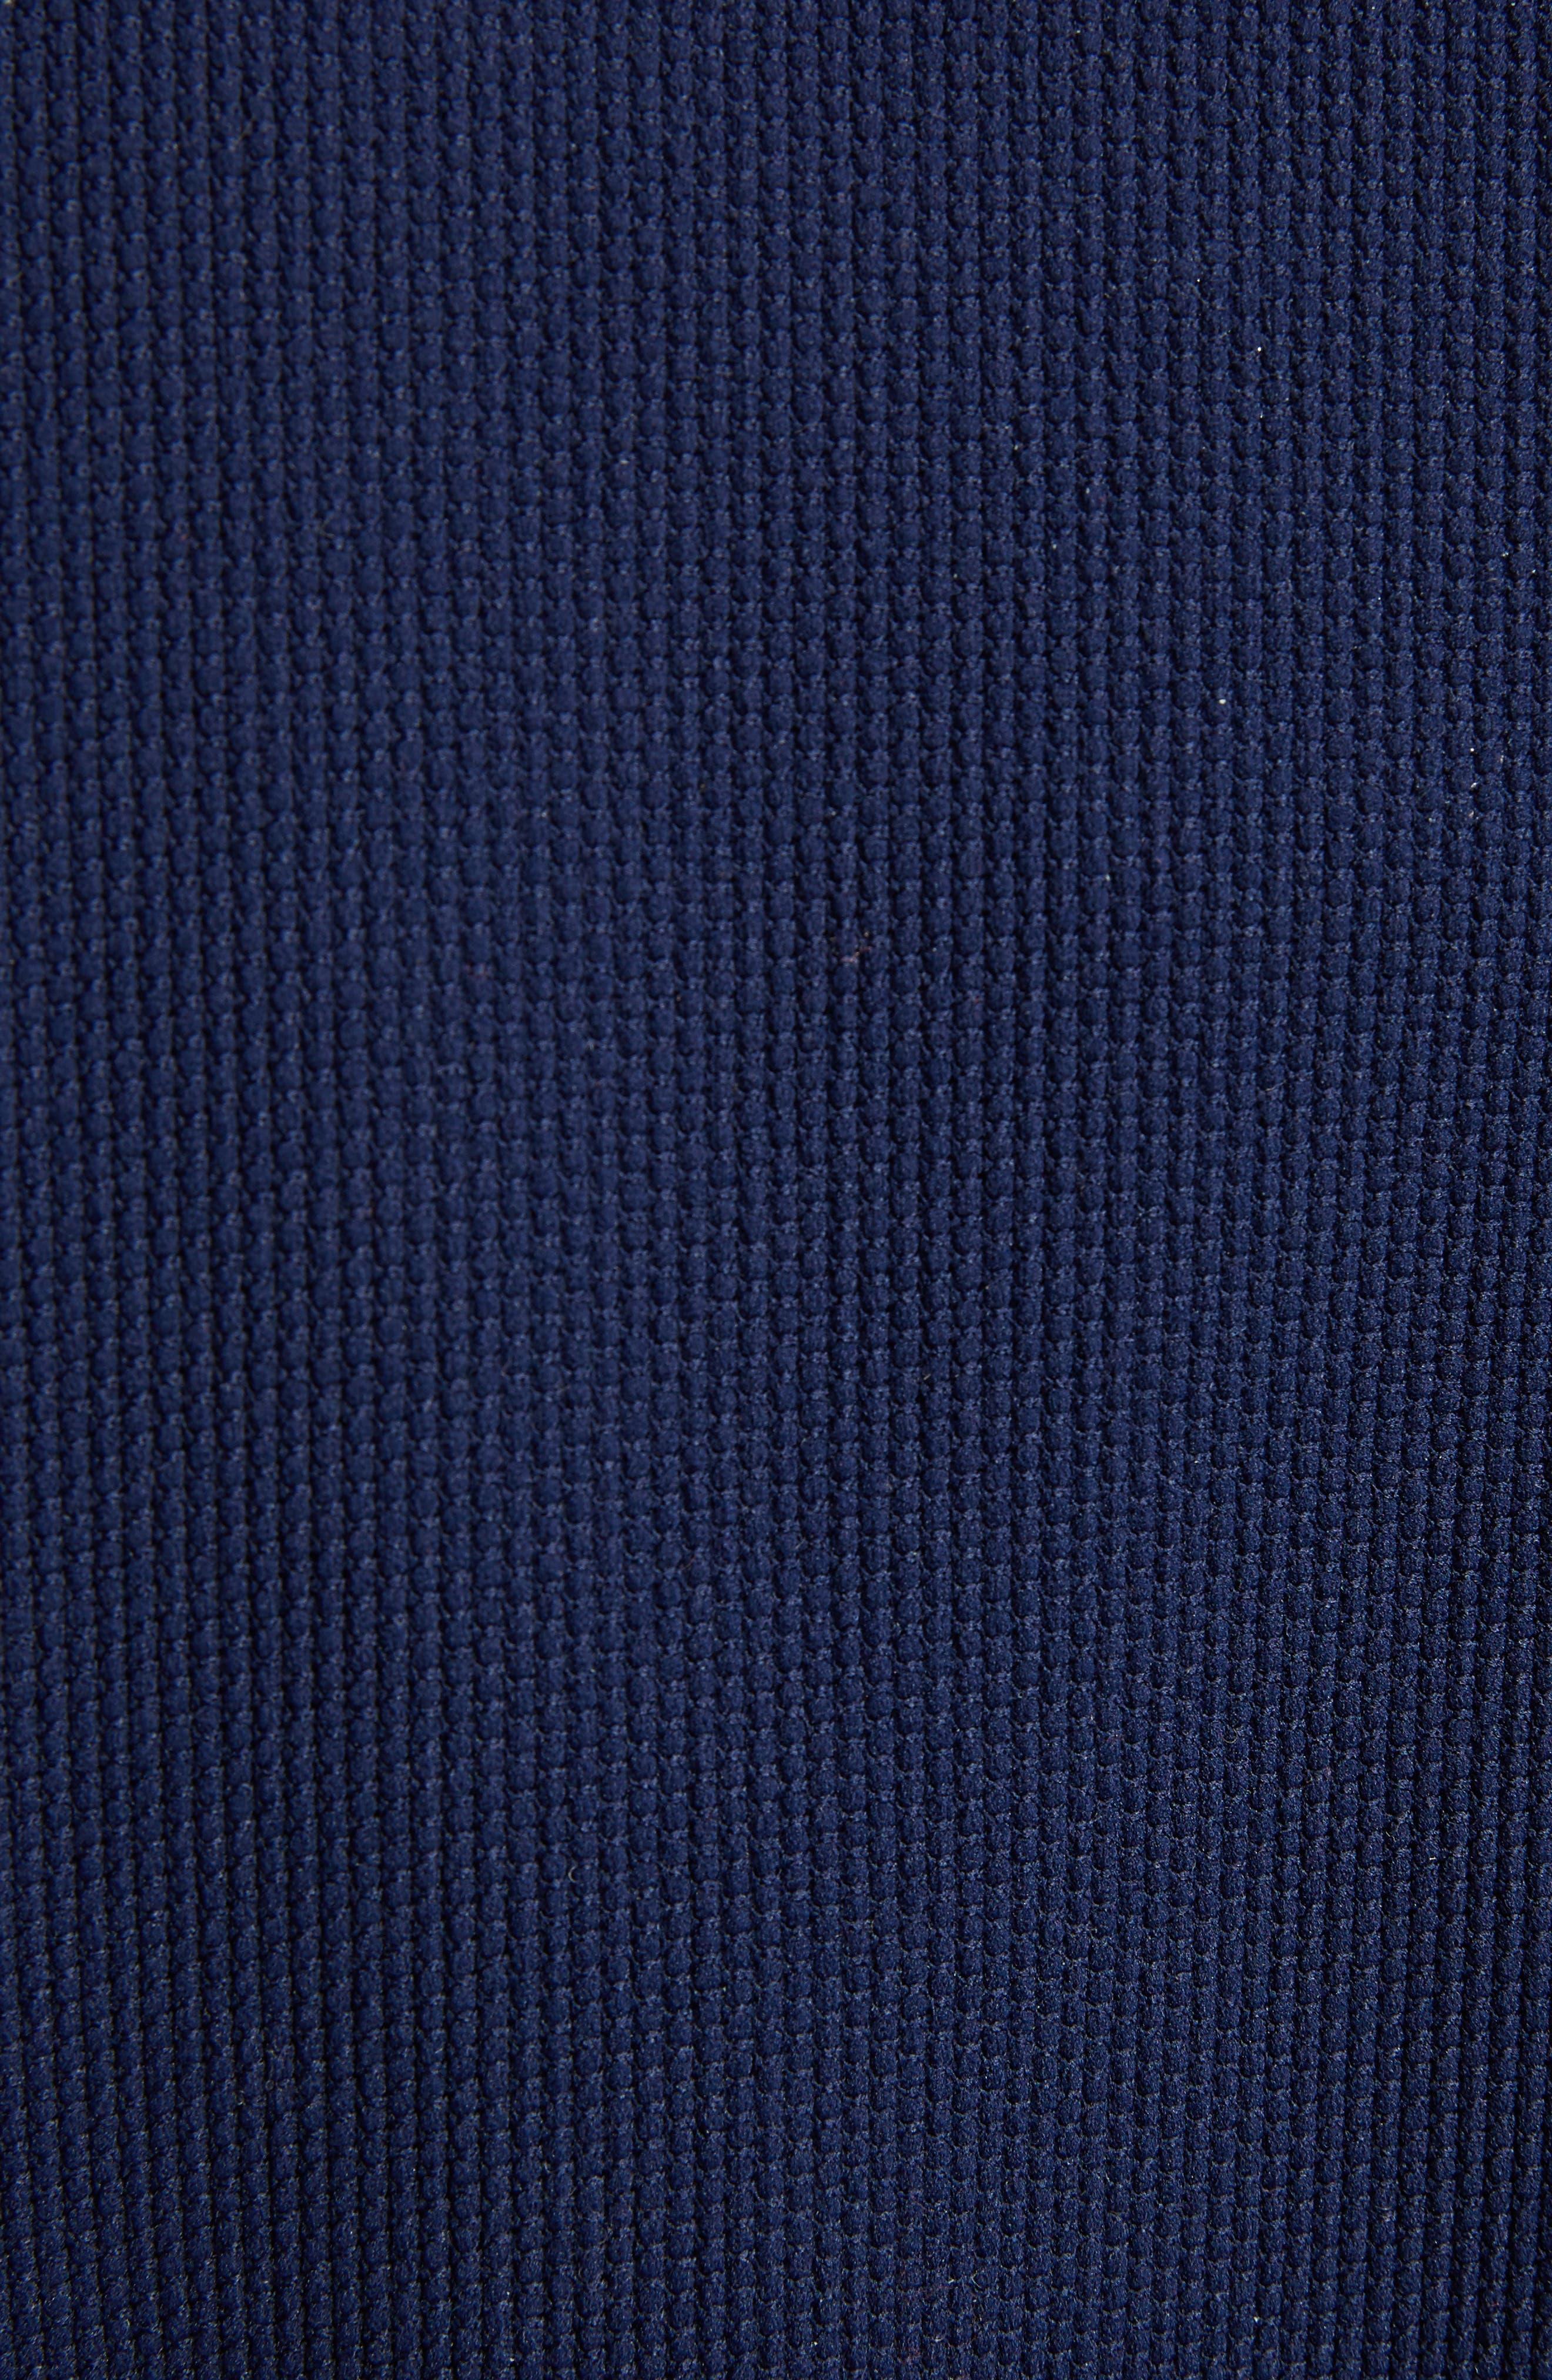 Colorblock Jacquard Knit Sweater,                             Alternate thumbnail 5, color,                             410